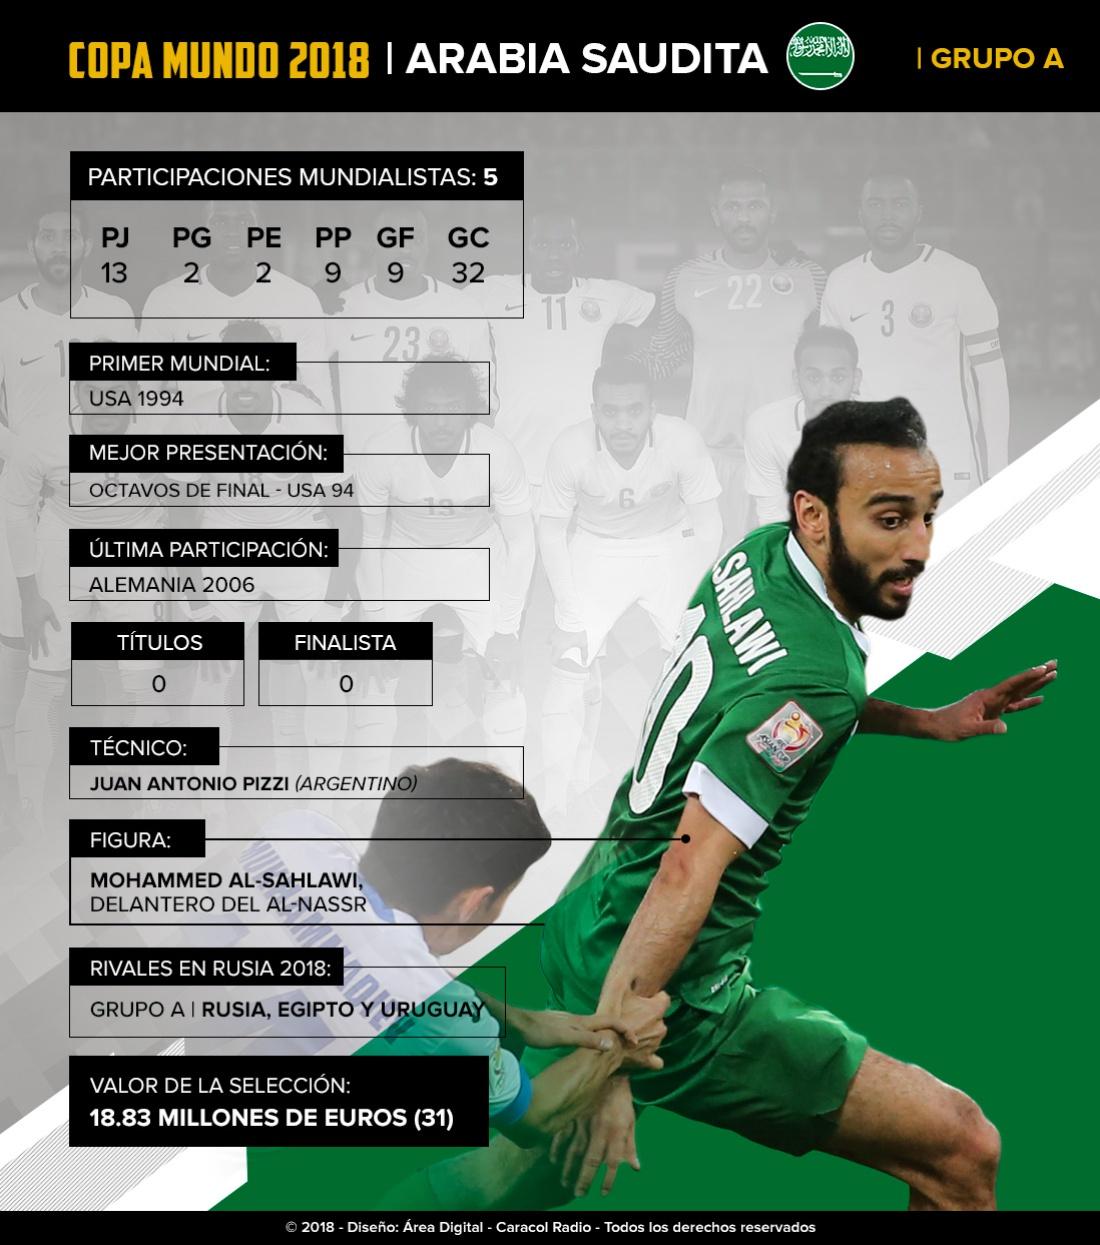 Mundial 2018: Arabia Saudita: el equipo árabe buscará llegar a octavos por 2da vez